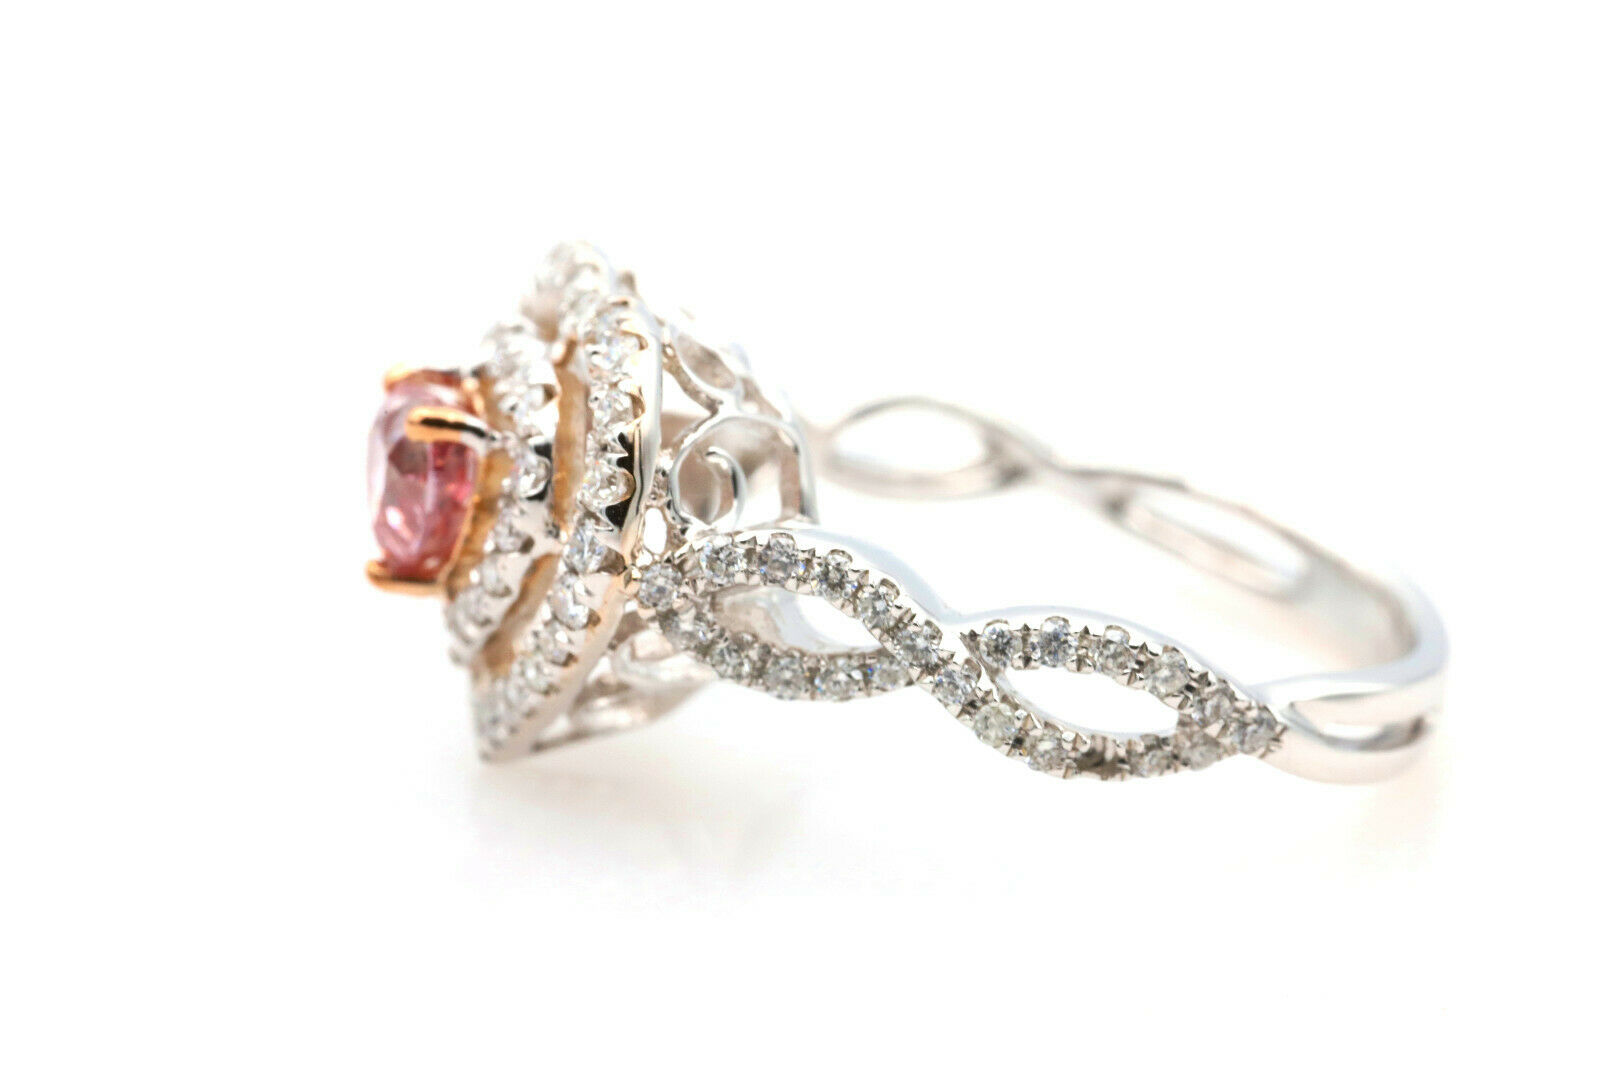 Argyle 1.07ct Natural Fancy Deep Pink Diamond Engagement Ring GIA 18K White Gold 2